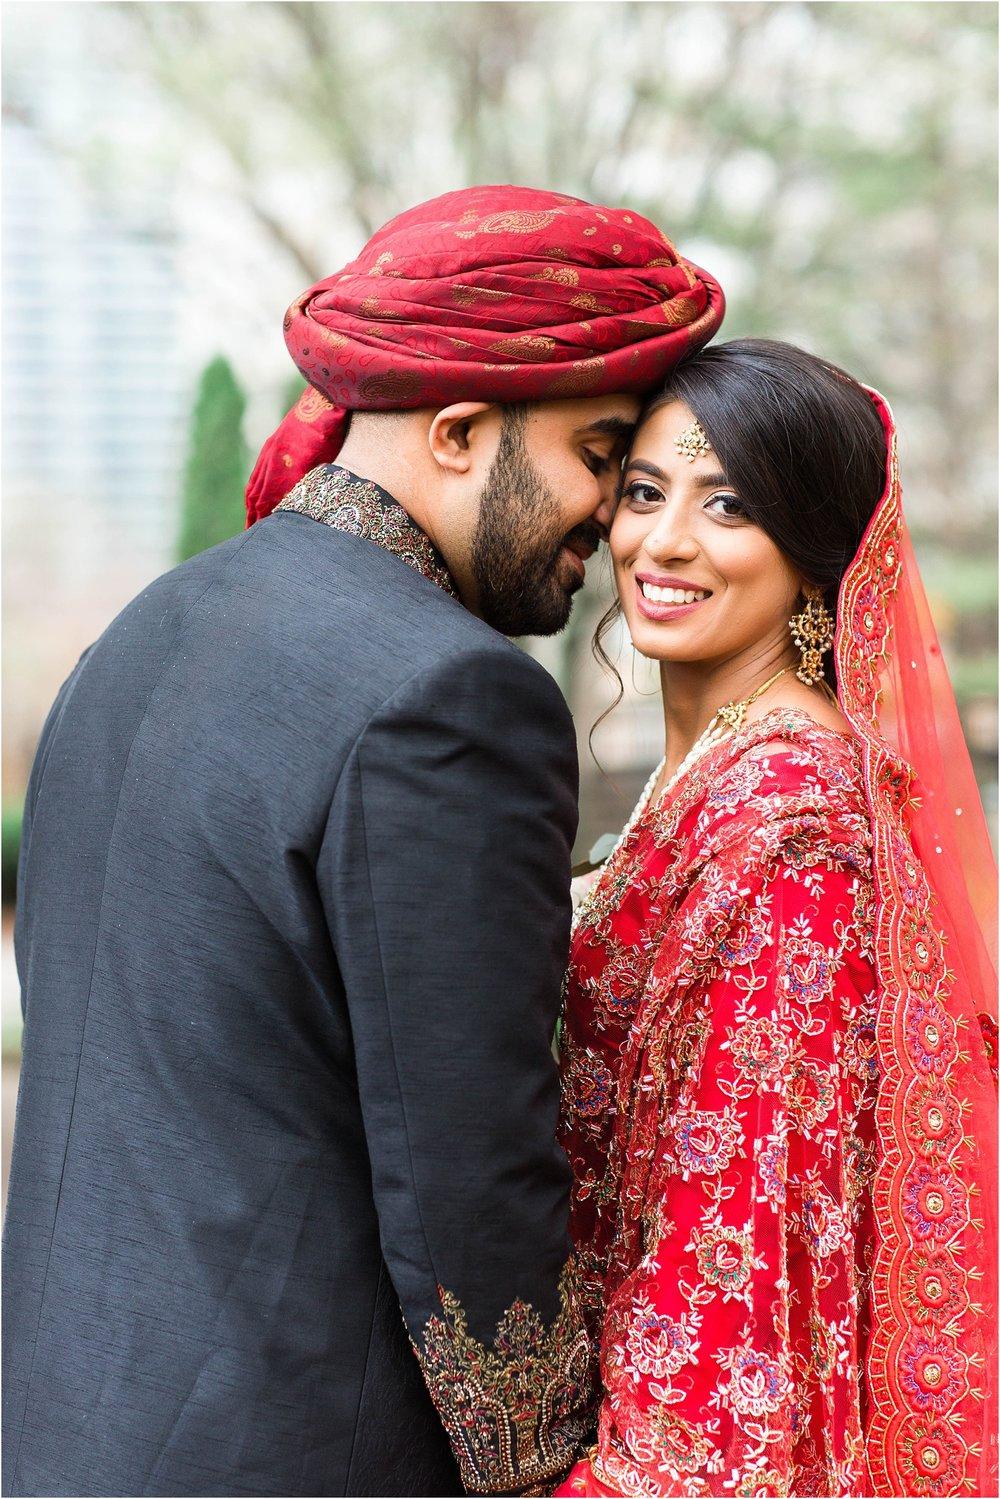 Jame-Masjid-Coopers-Mosque-Kariya-Park-Cherry-Blossoms-Wedding-Toronto-Mississauga-Brampton-Scarborough-GTA-Pakistani-Indian-Wedding-Engagement-Photographer-Photography_0052.jpg